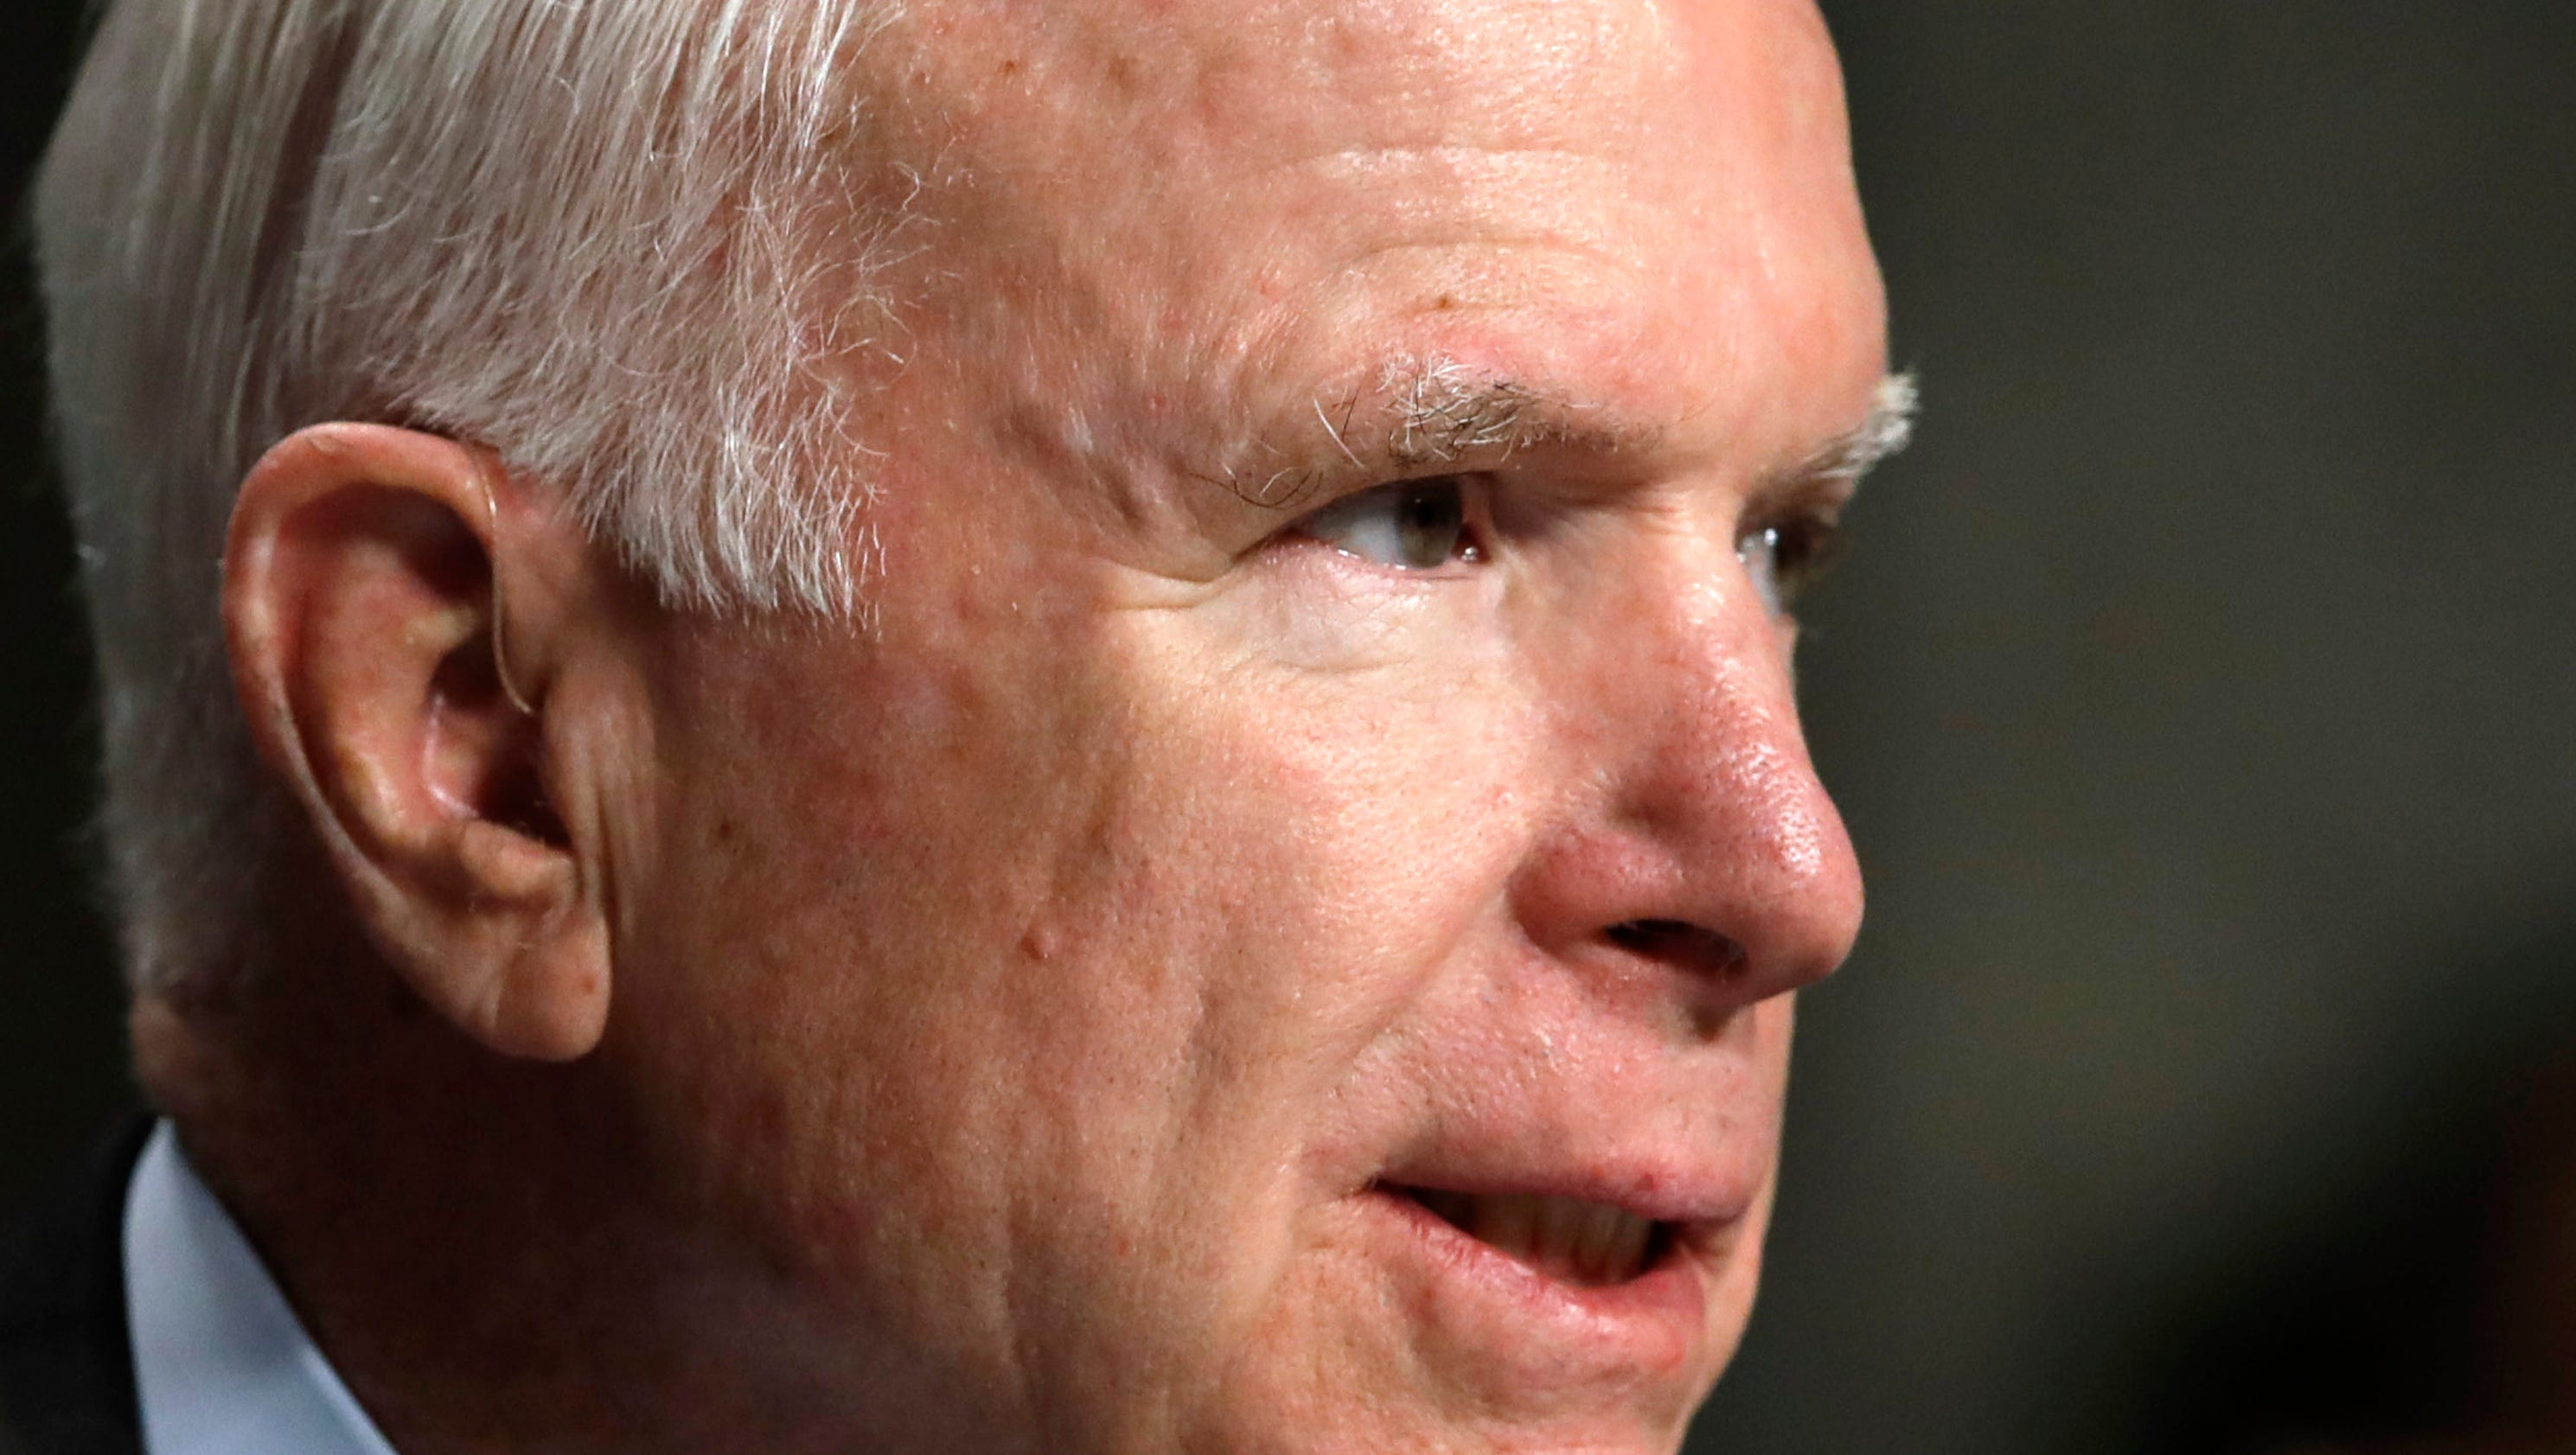 usatoday.com - EJ Montini - John McCain mocks Donald Trump's deferment 'bone spurs' (without naming him)